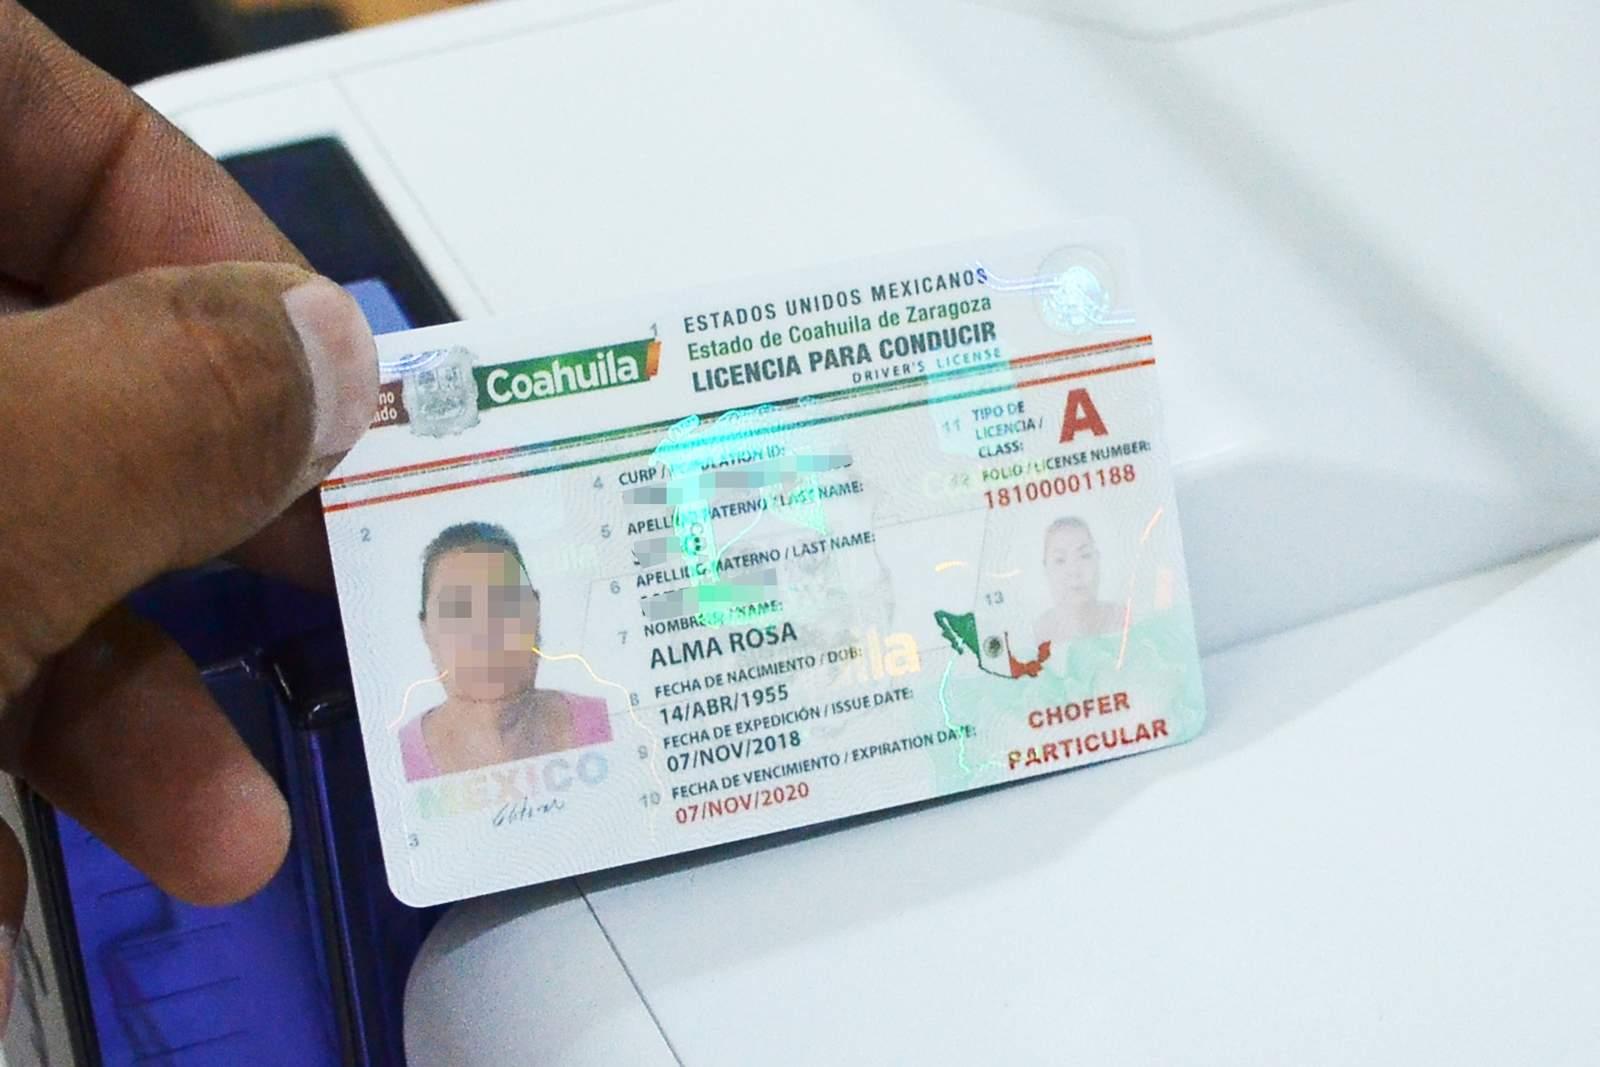 Expiden en Coahuila licencias de conducir con